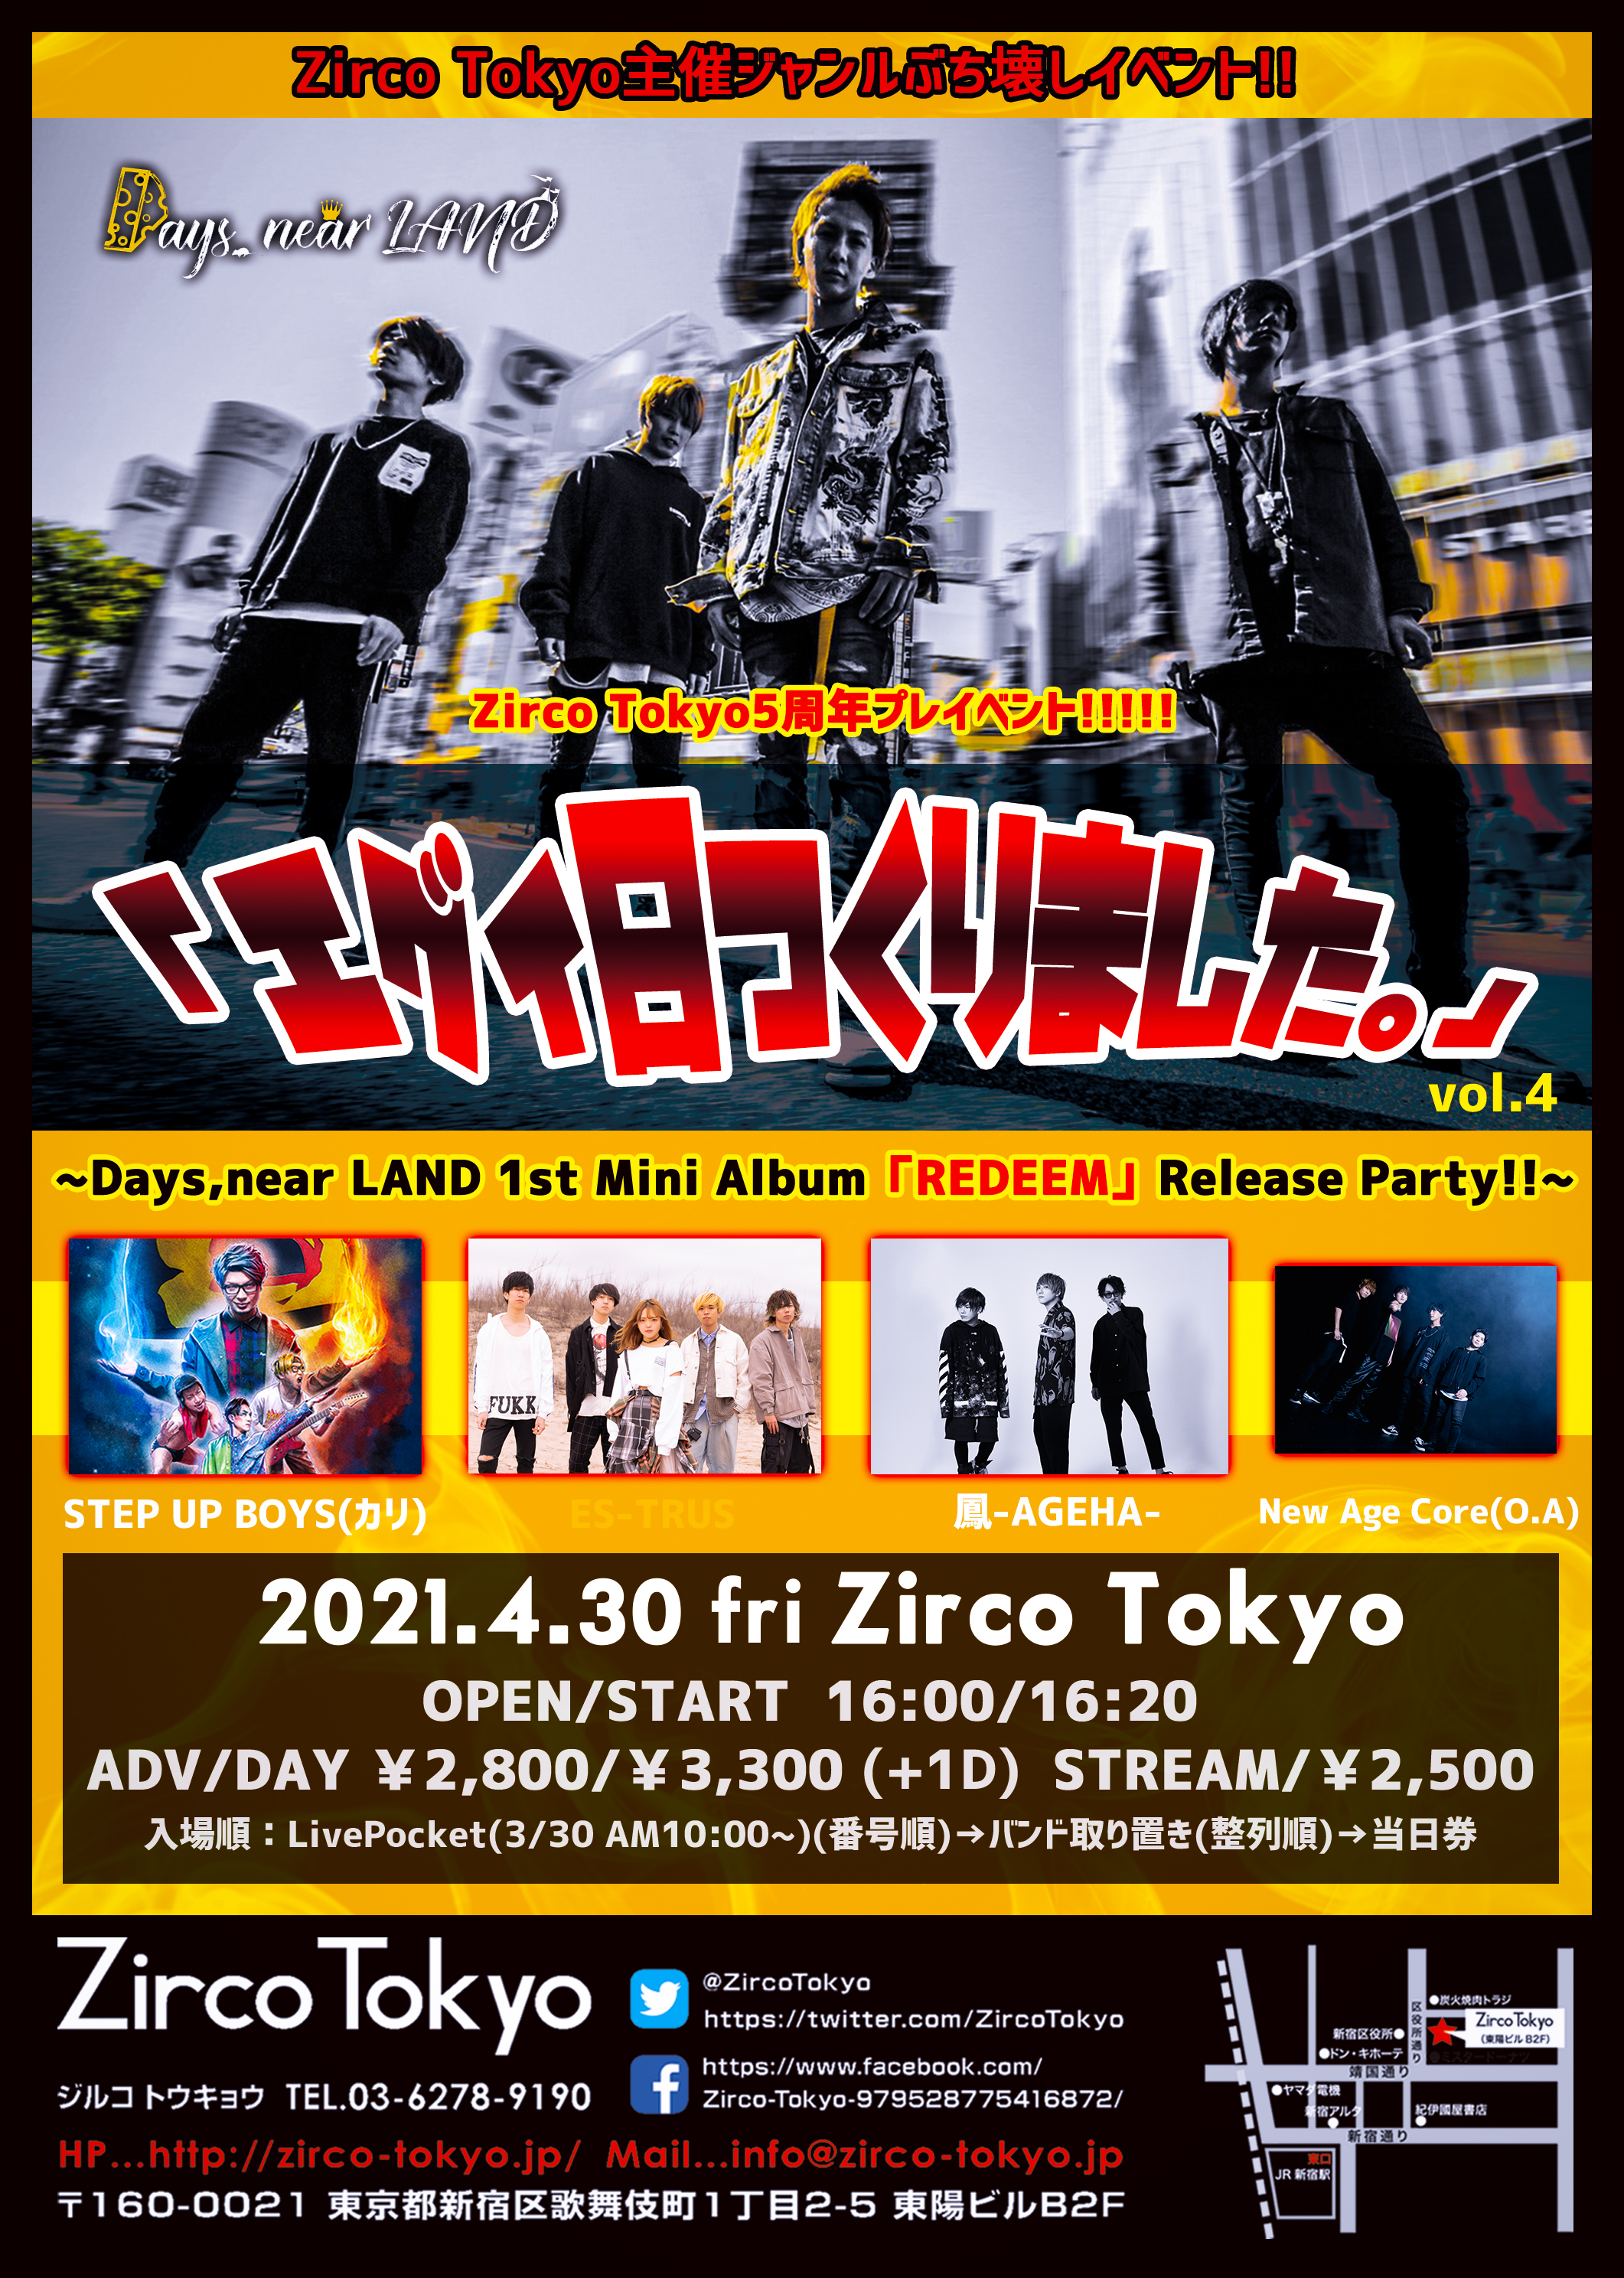 Zirco Tokyo 5周年プレイベント「エグイ日つくりました。」vol.4 ~Days,near LAND 1st Mini Album「REDEEM」Release Party!!~